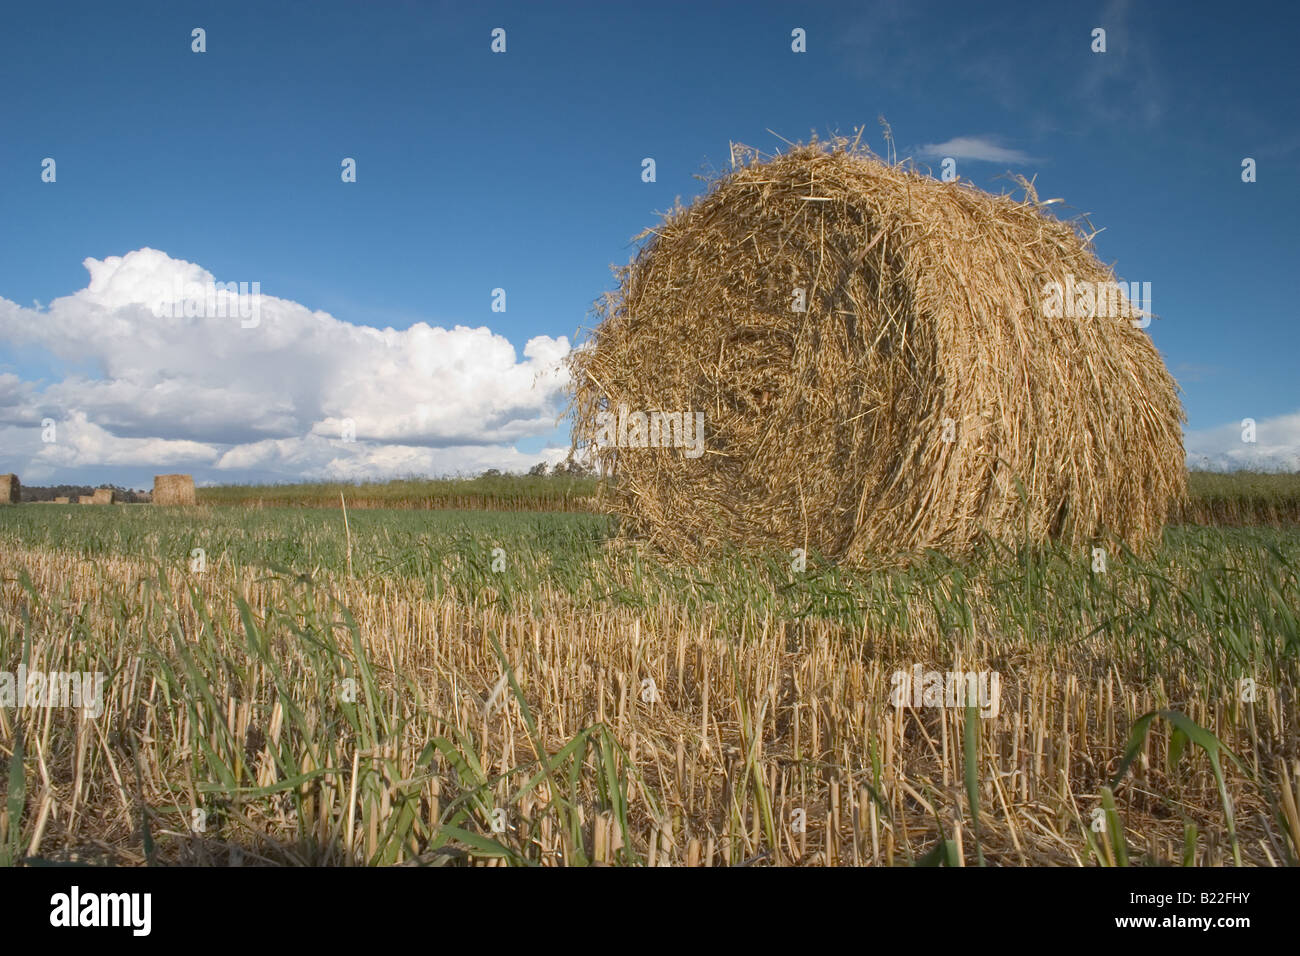 Round Haystack - Stock Image